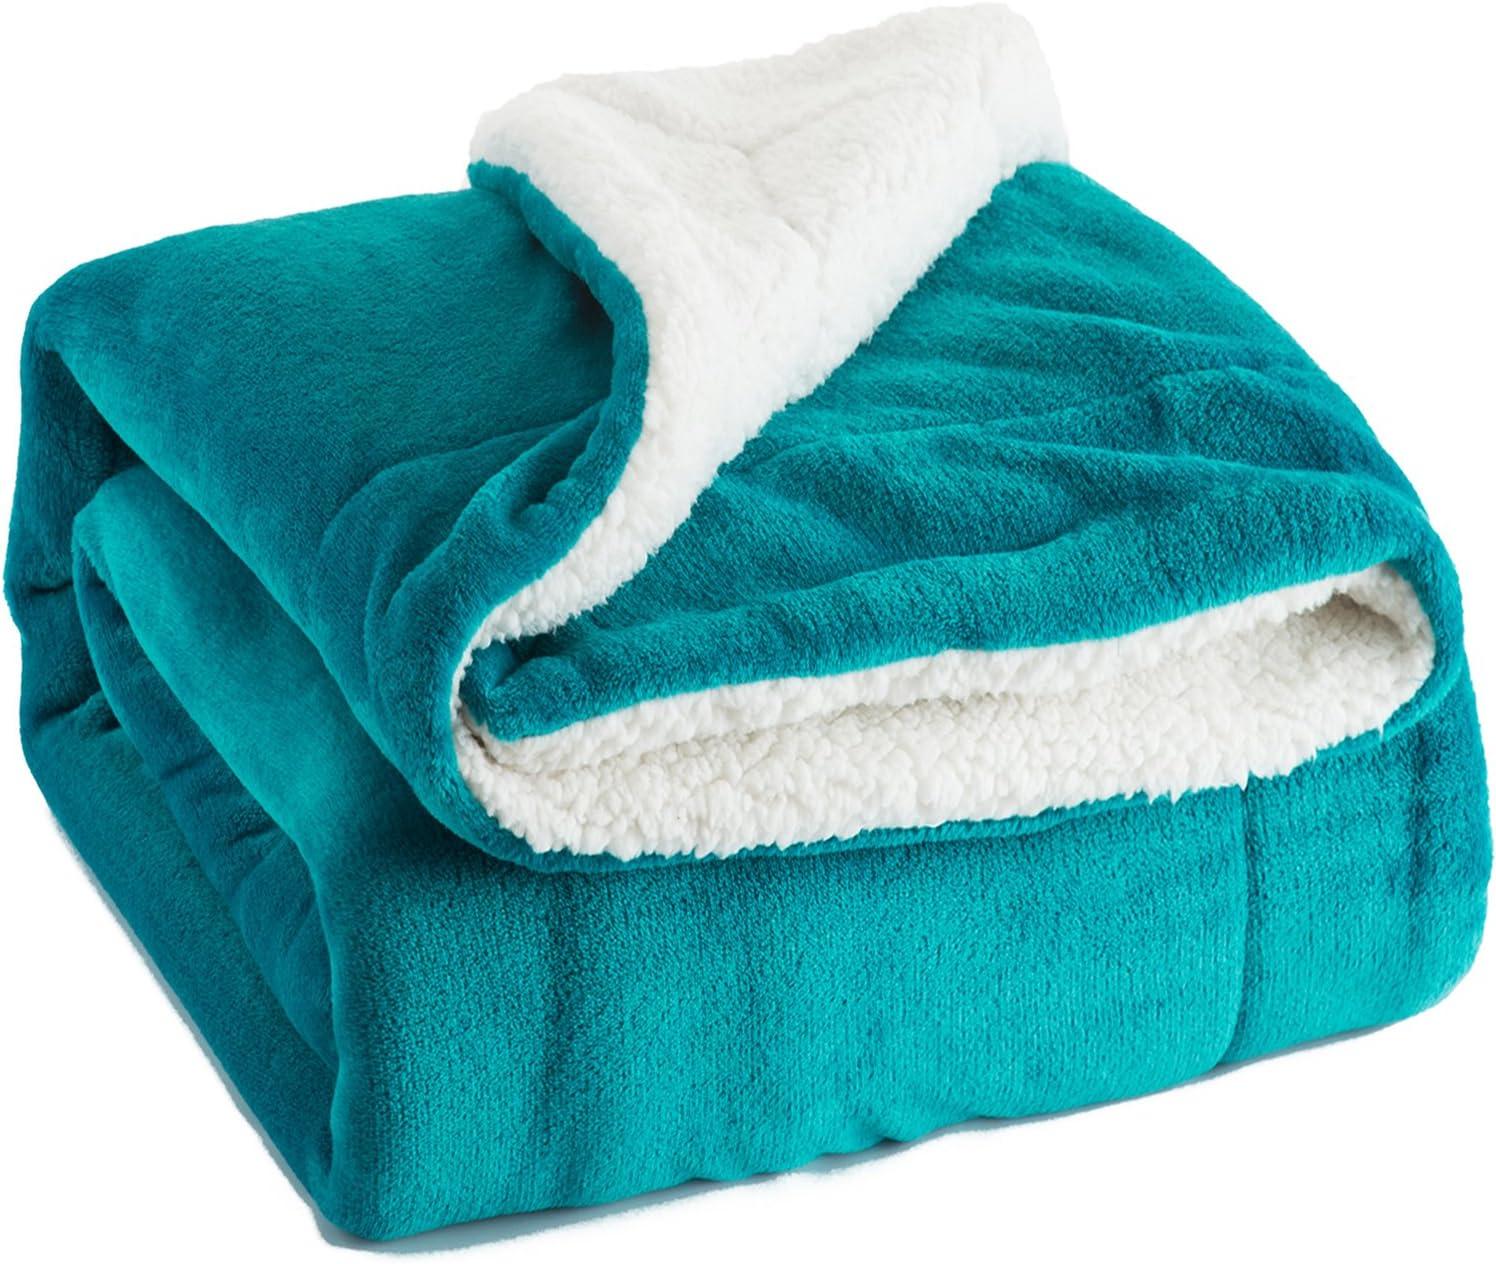 Bedsure Sherpa Fleece Blanket Queen Size Teal Turquoise Aqua Plush Blanket Fuzzy Soft Blanket Microfiber